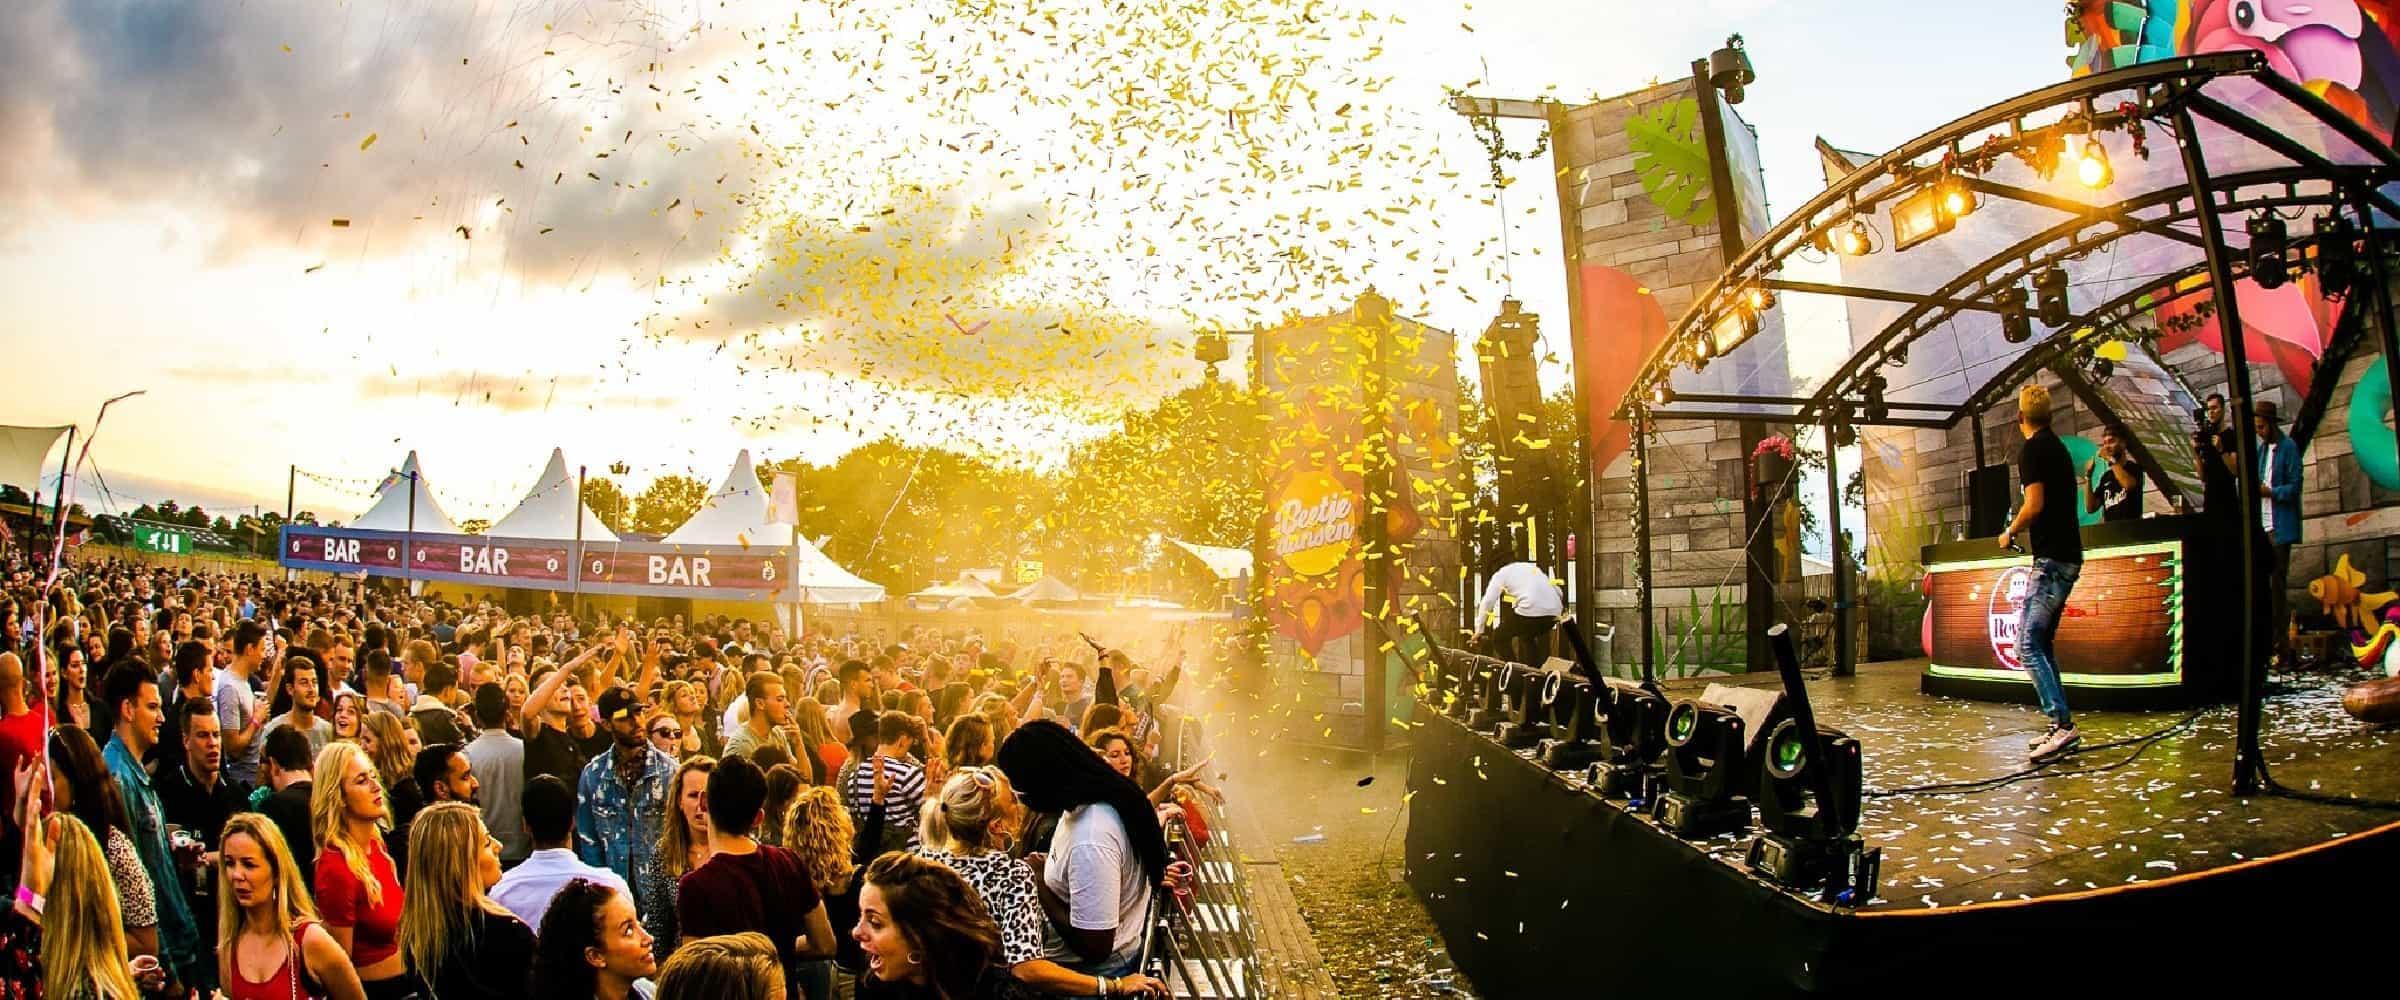 how to organize a music festival checklist